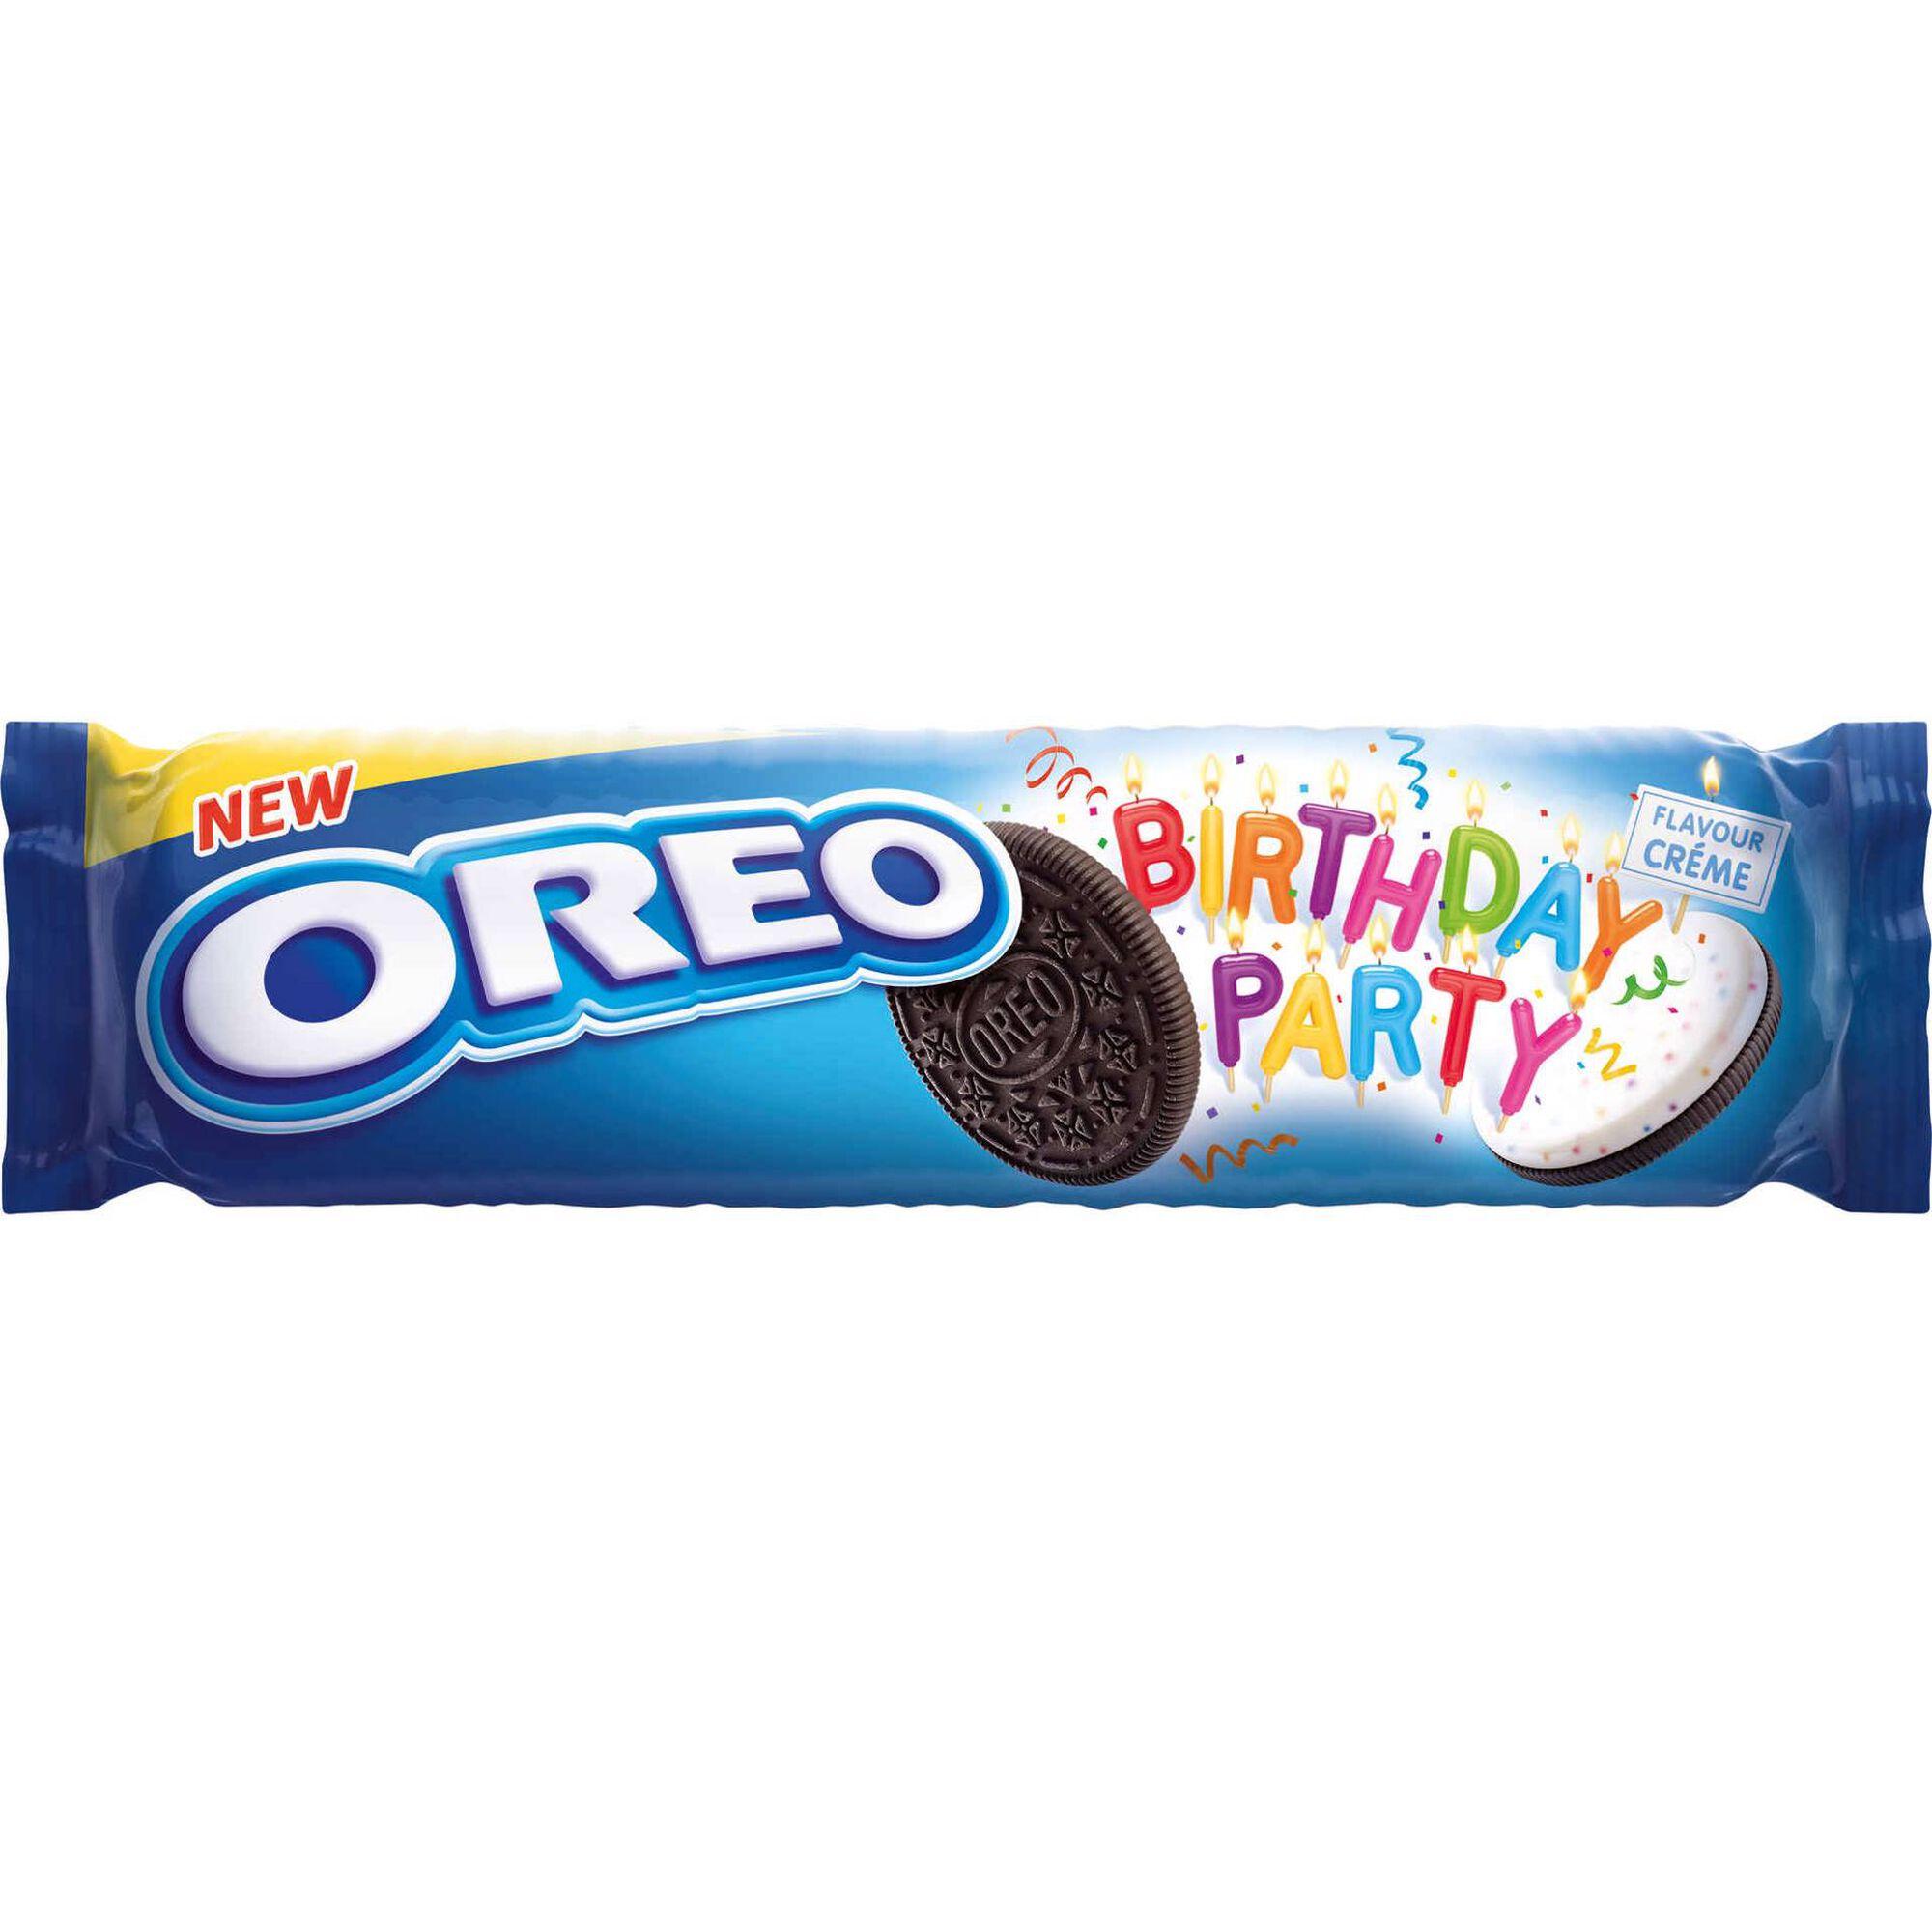 Bolachas de Chocolate com Recheio de Creme e Pepitas Coloridas Birthday Party